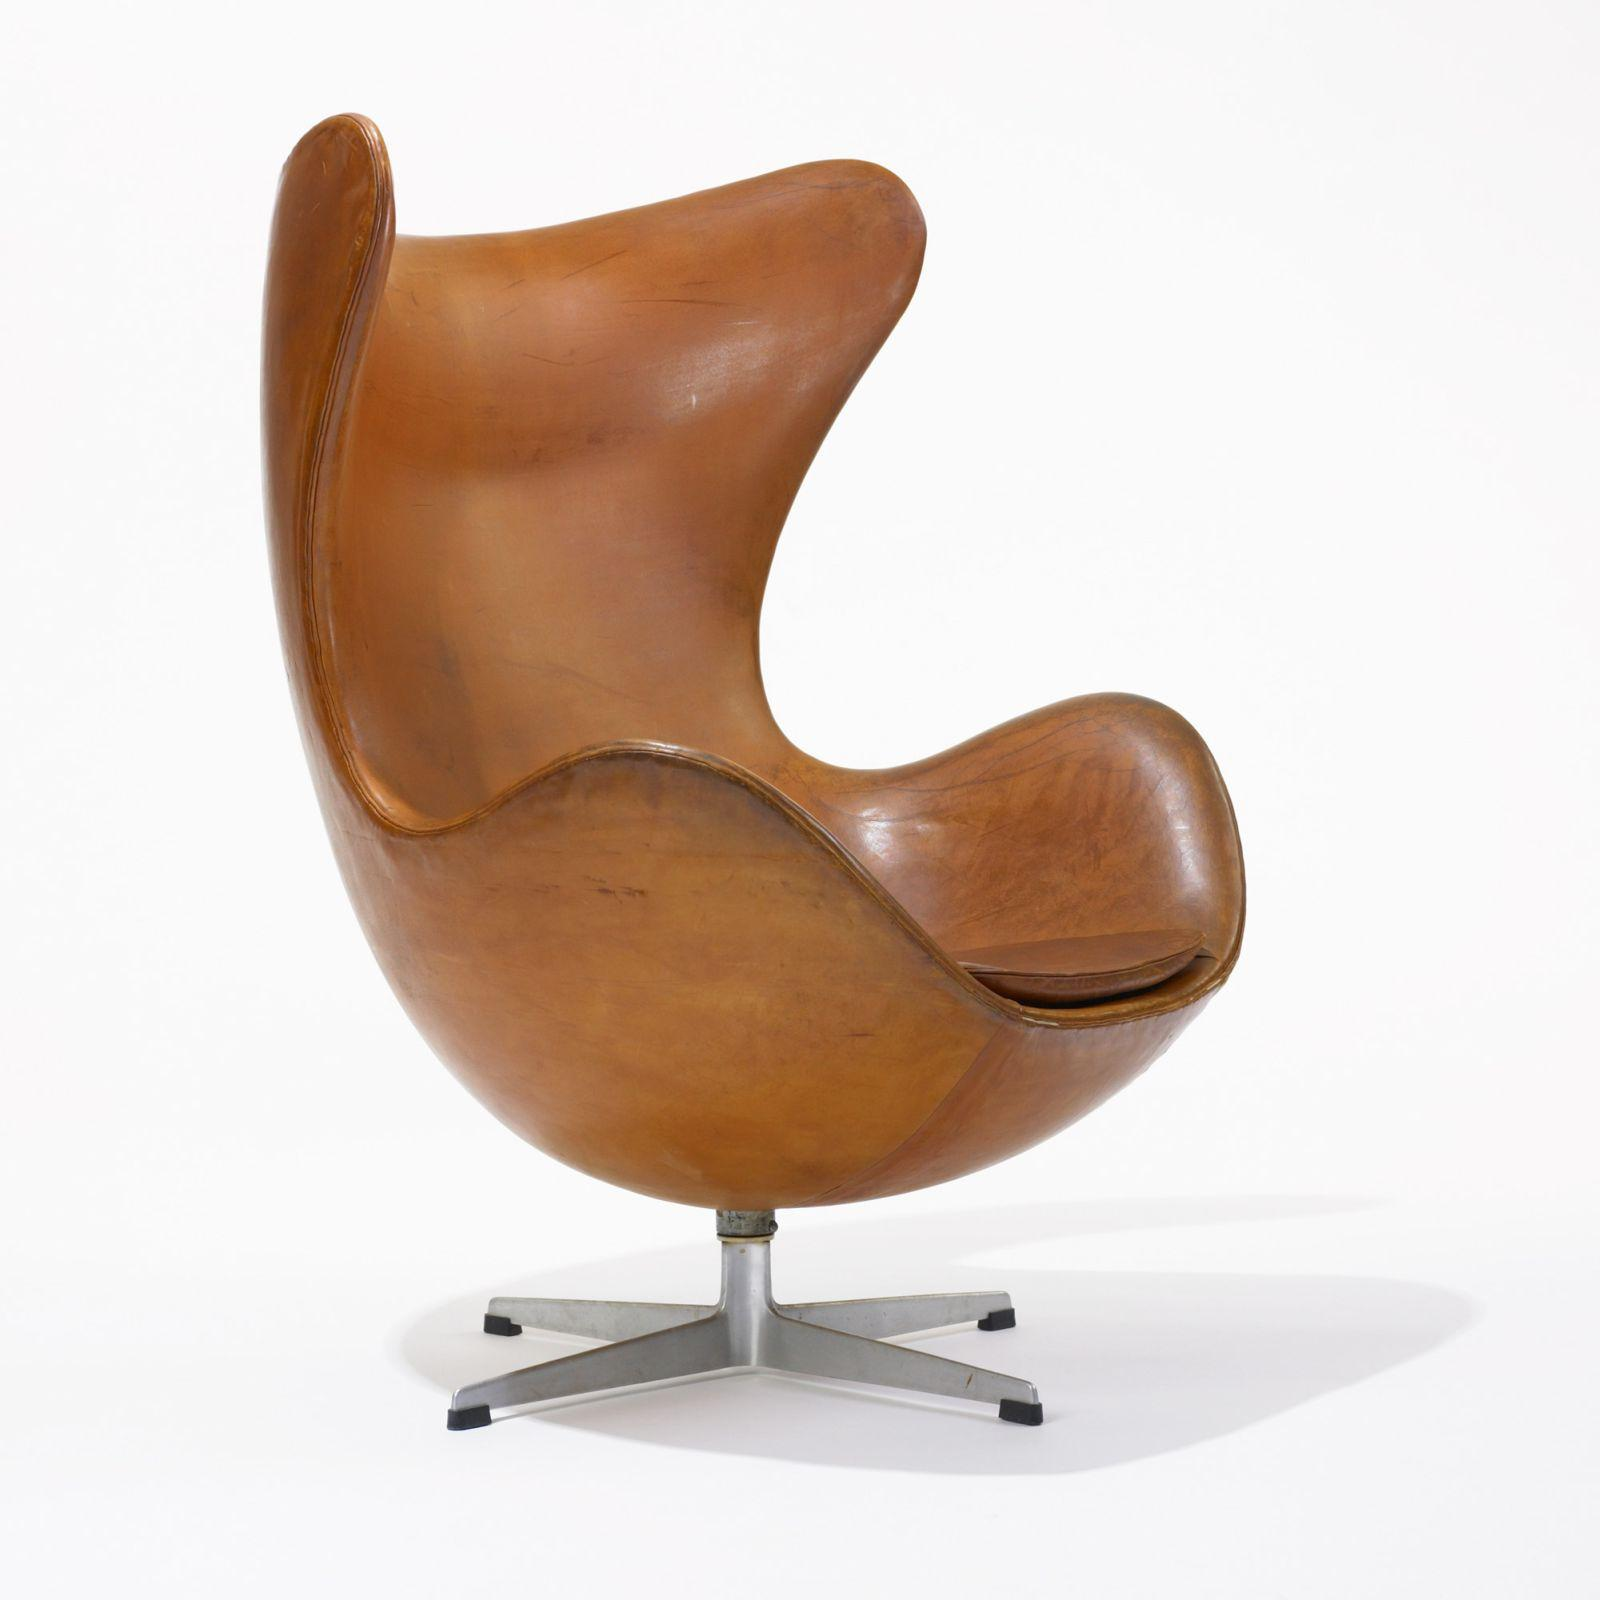 Sitting Pretty Kingscliff Design History